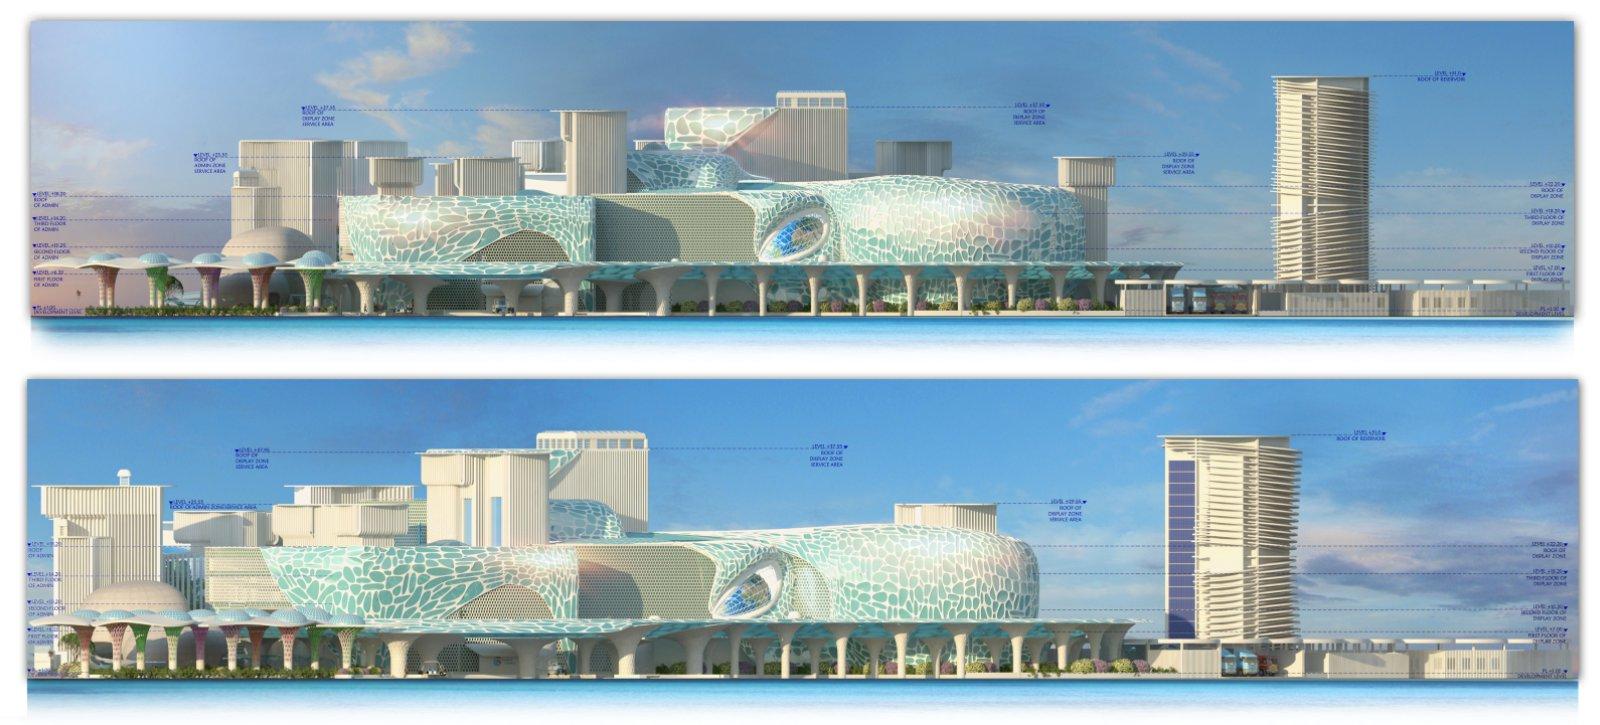 Arabian Sea Oceanarium